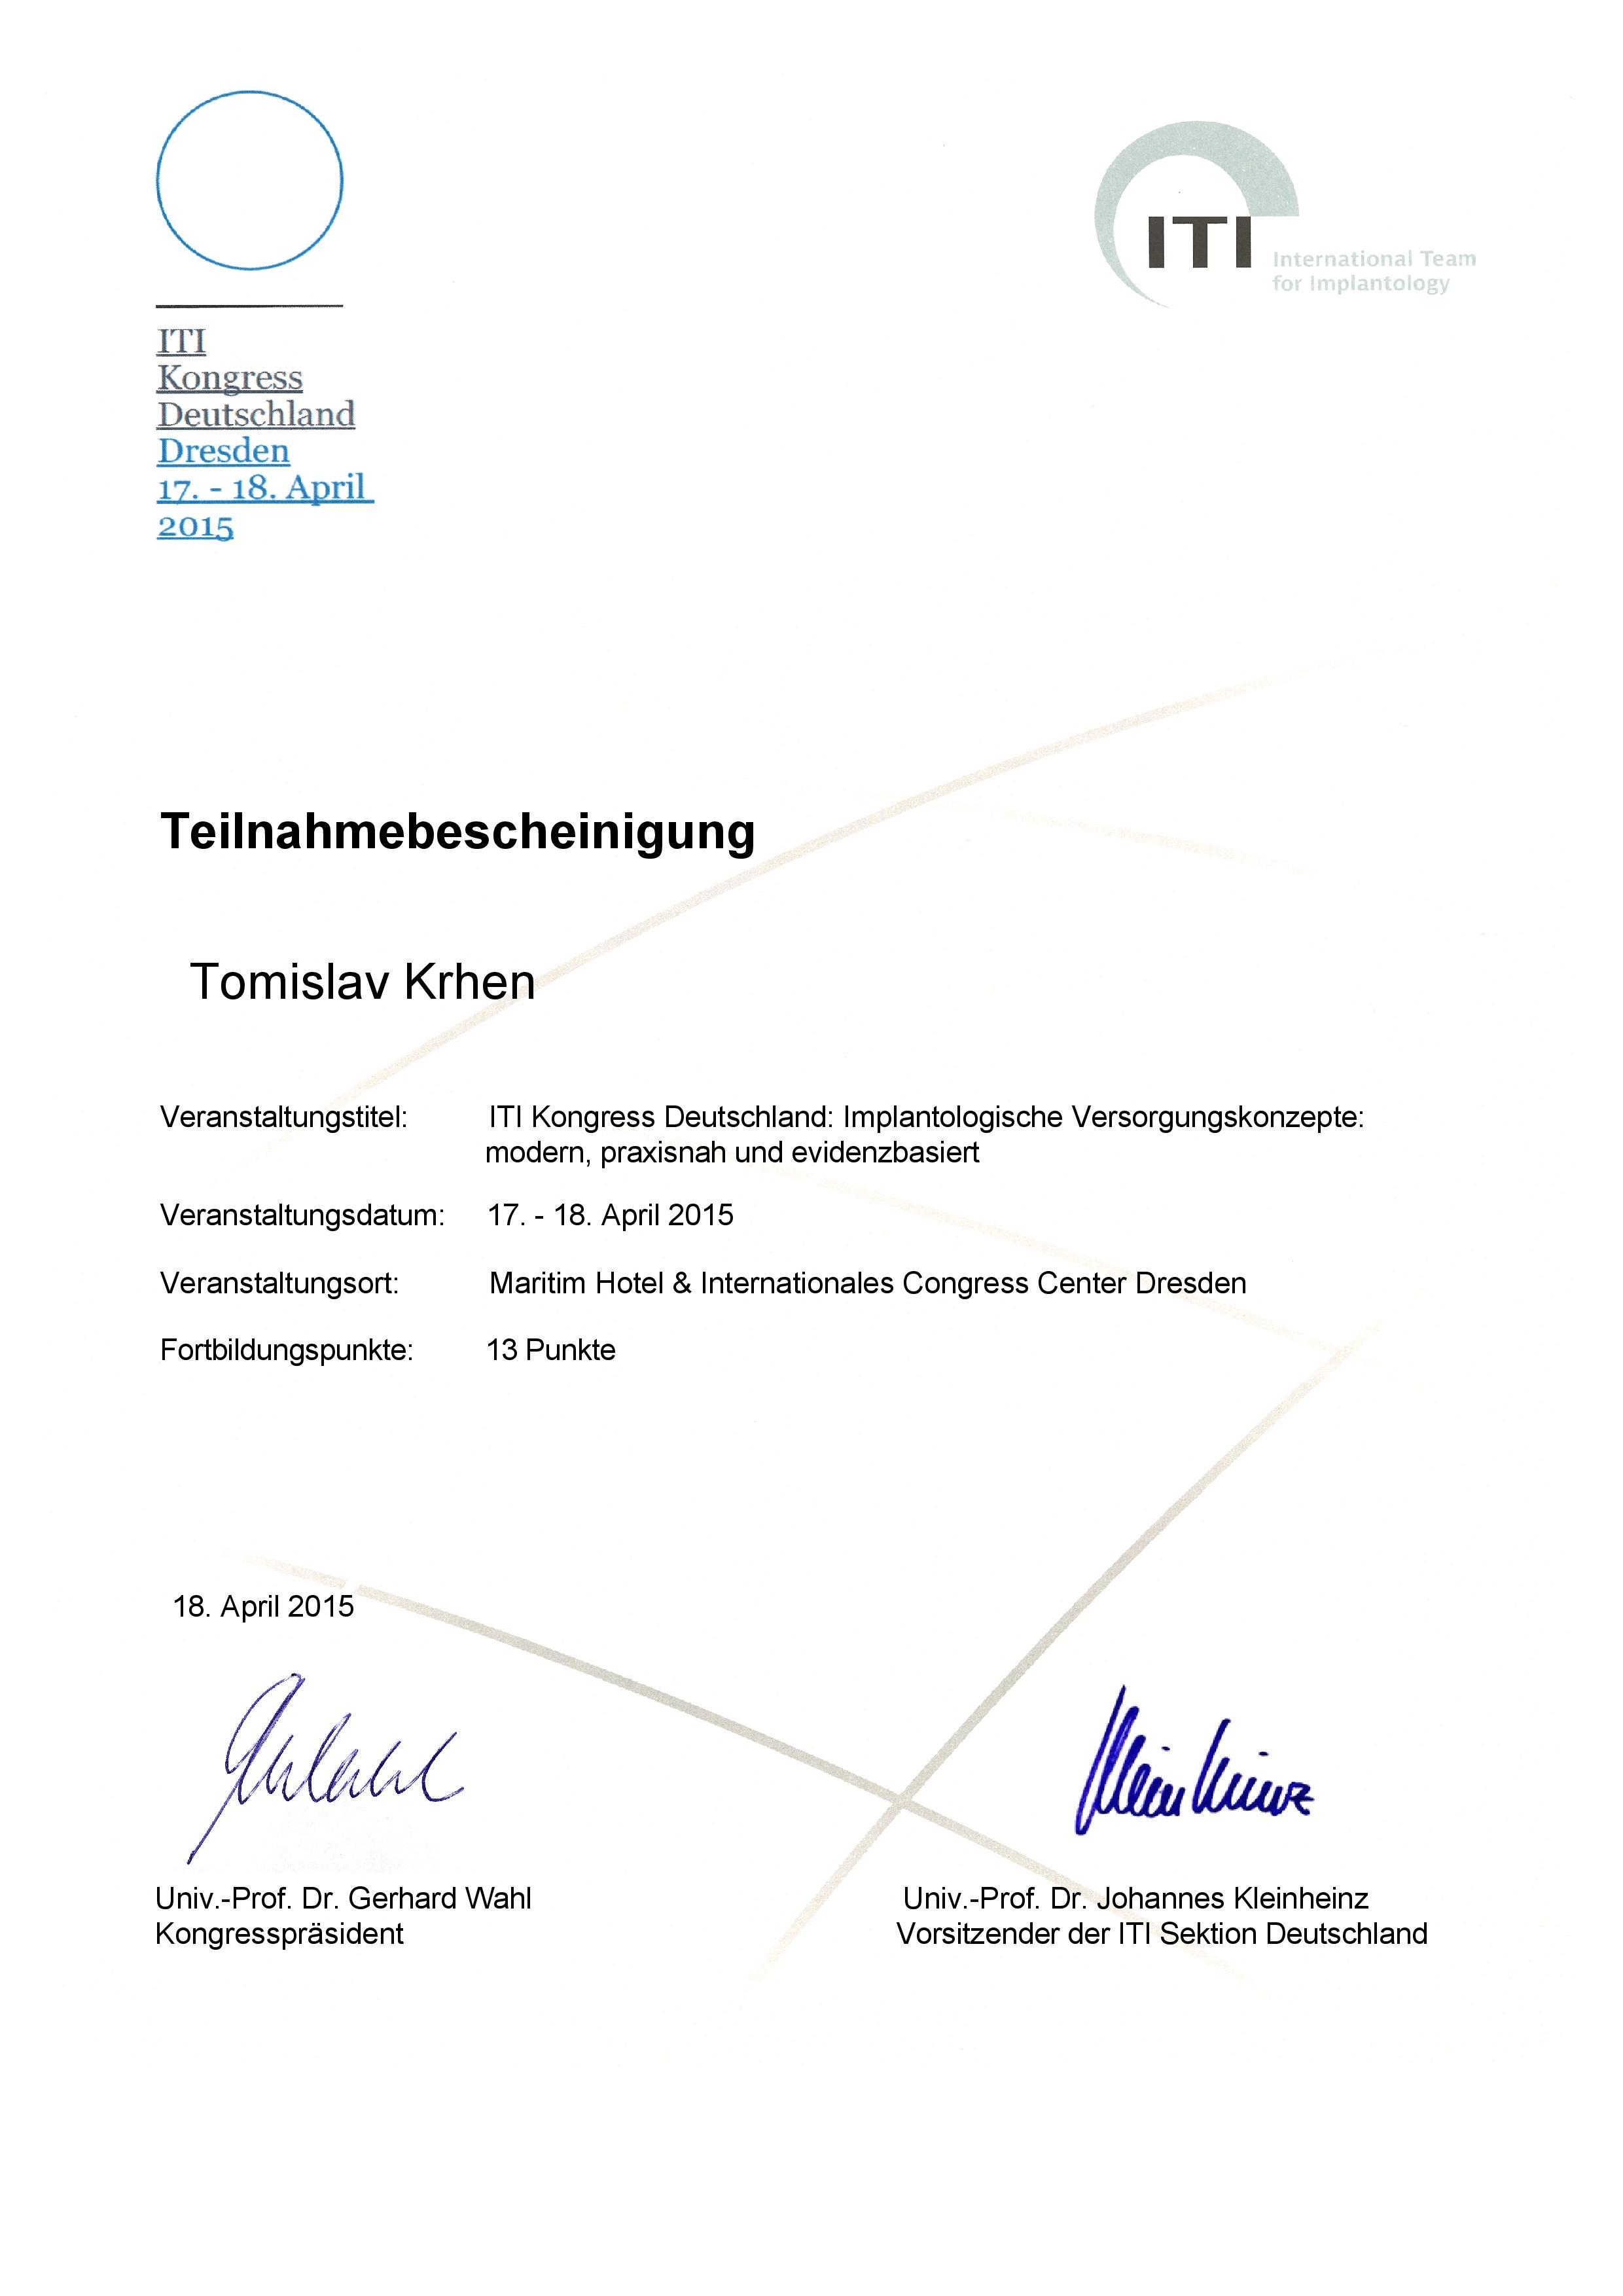 ITI Kongress Deutschland 2015